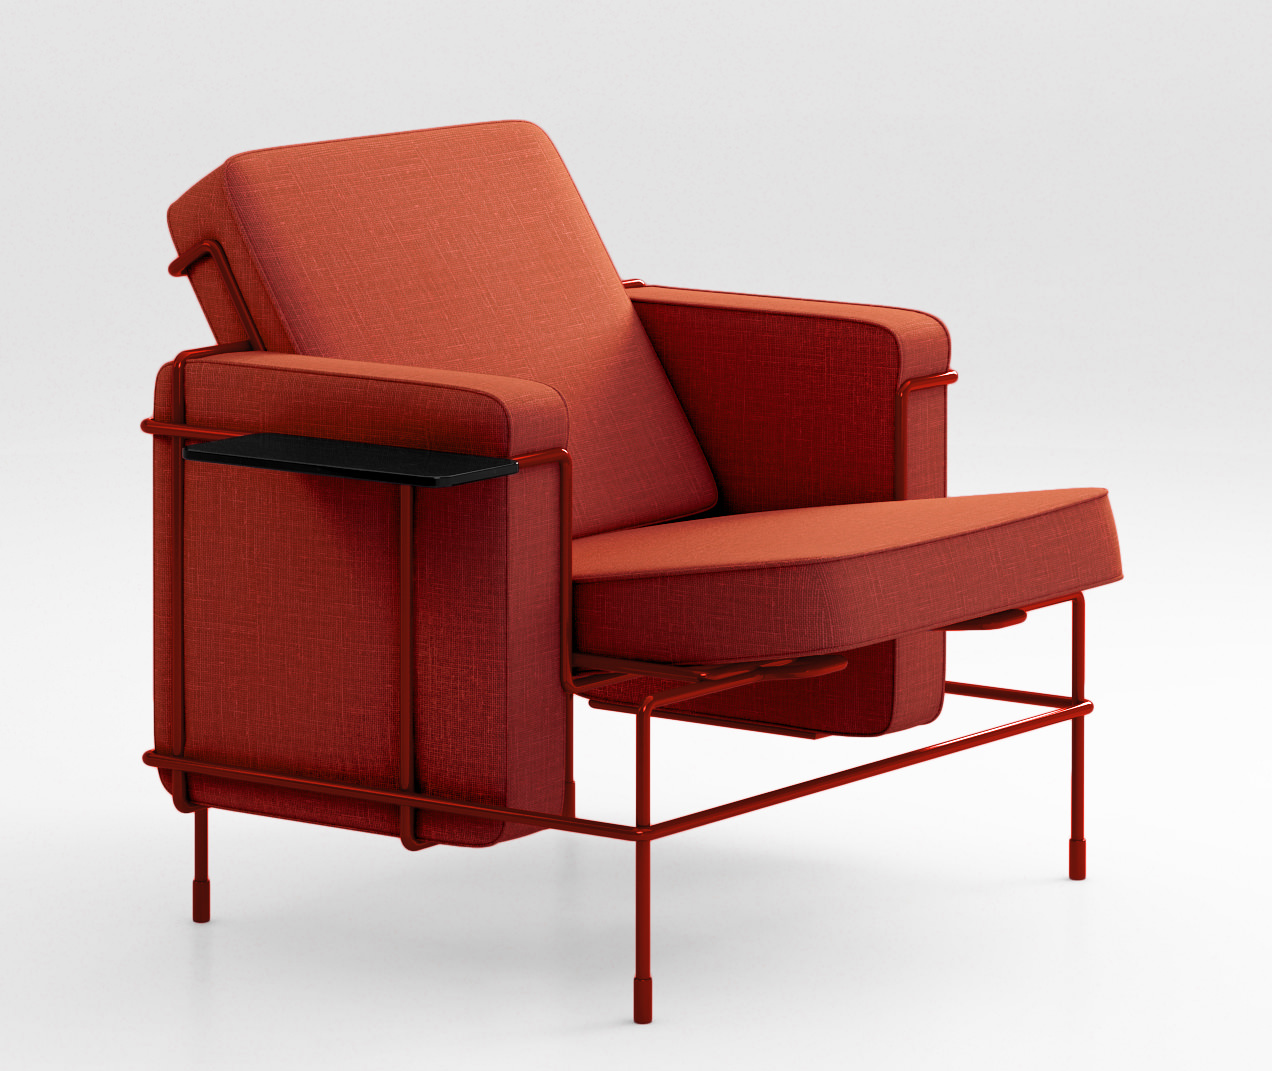 Magis Traffic Sofa Armchair Bench Lounge 3D Model MAX OBJ